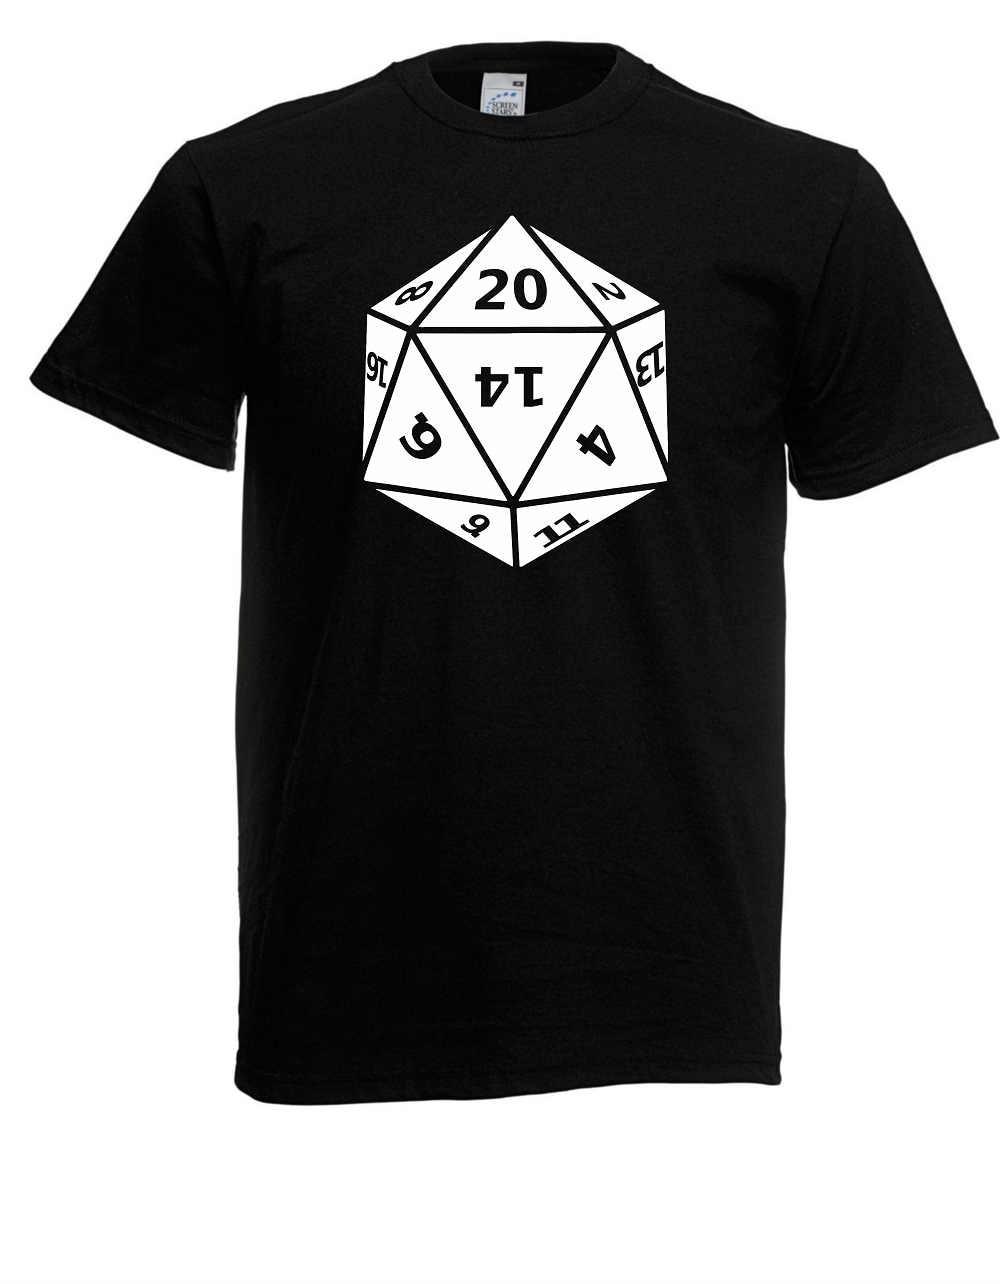 Casual T Shirt Male Pattern Herren T-Shirt I 20 Sided Dice Twenty I Spruche I Fun I Lustig bis 5XL Hot Sale Casual Clothing